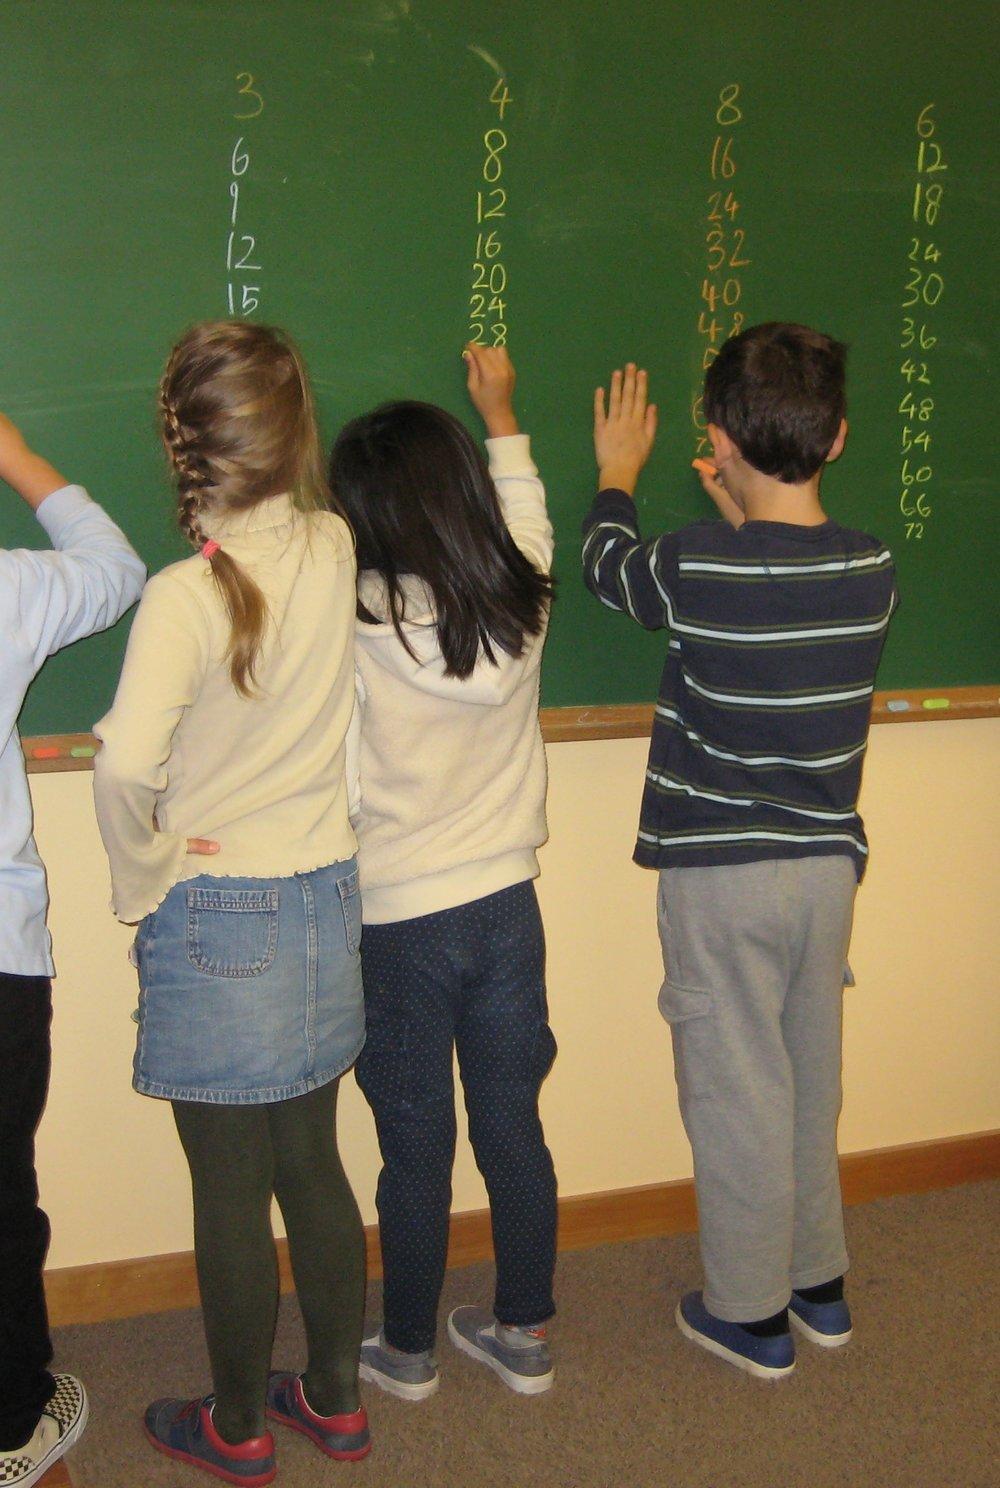 kids at chalkboard.jpg